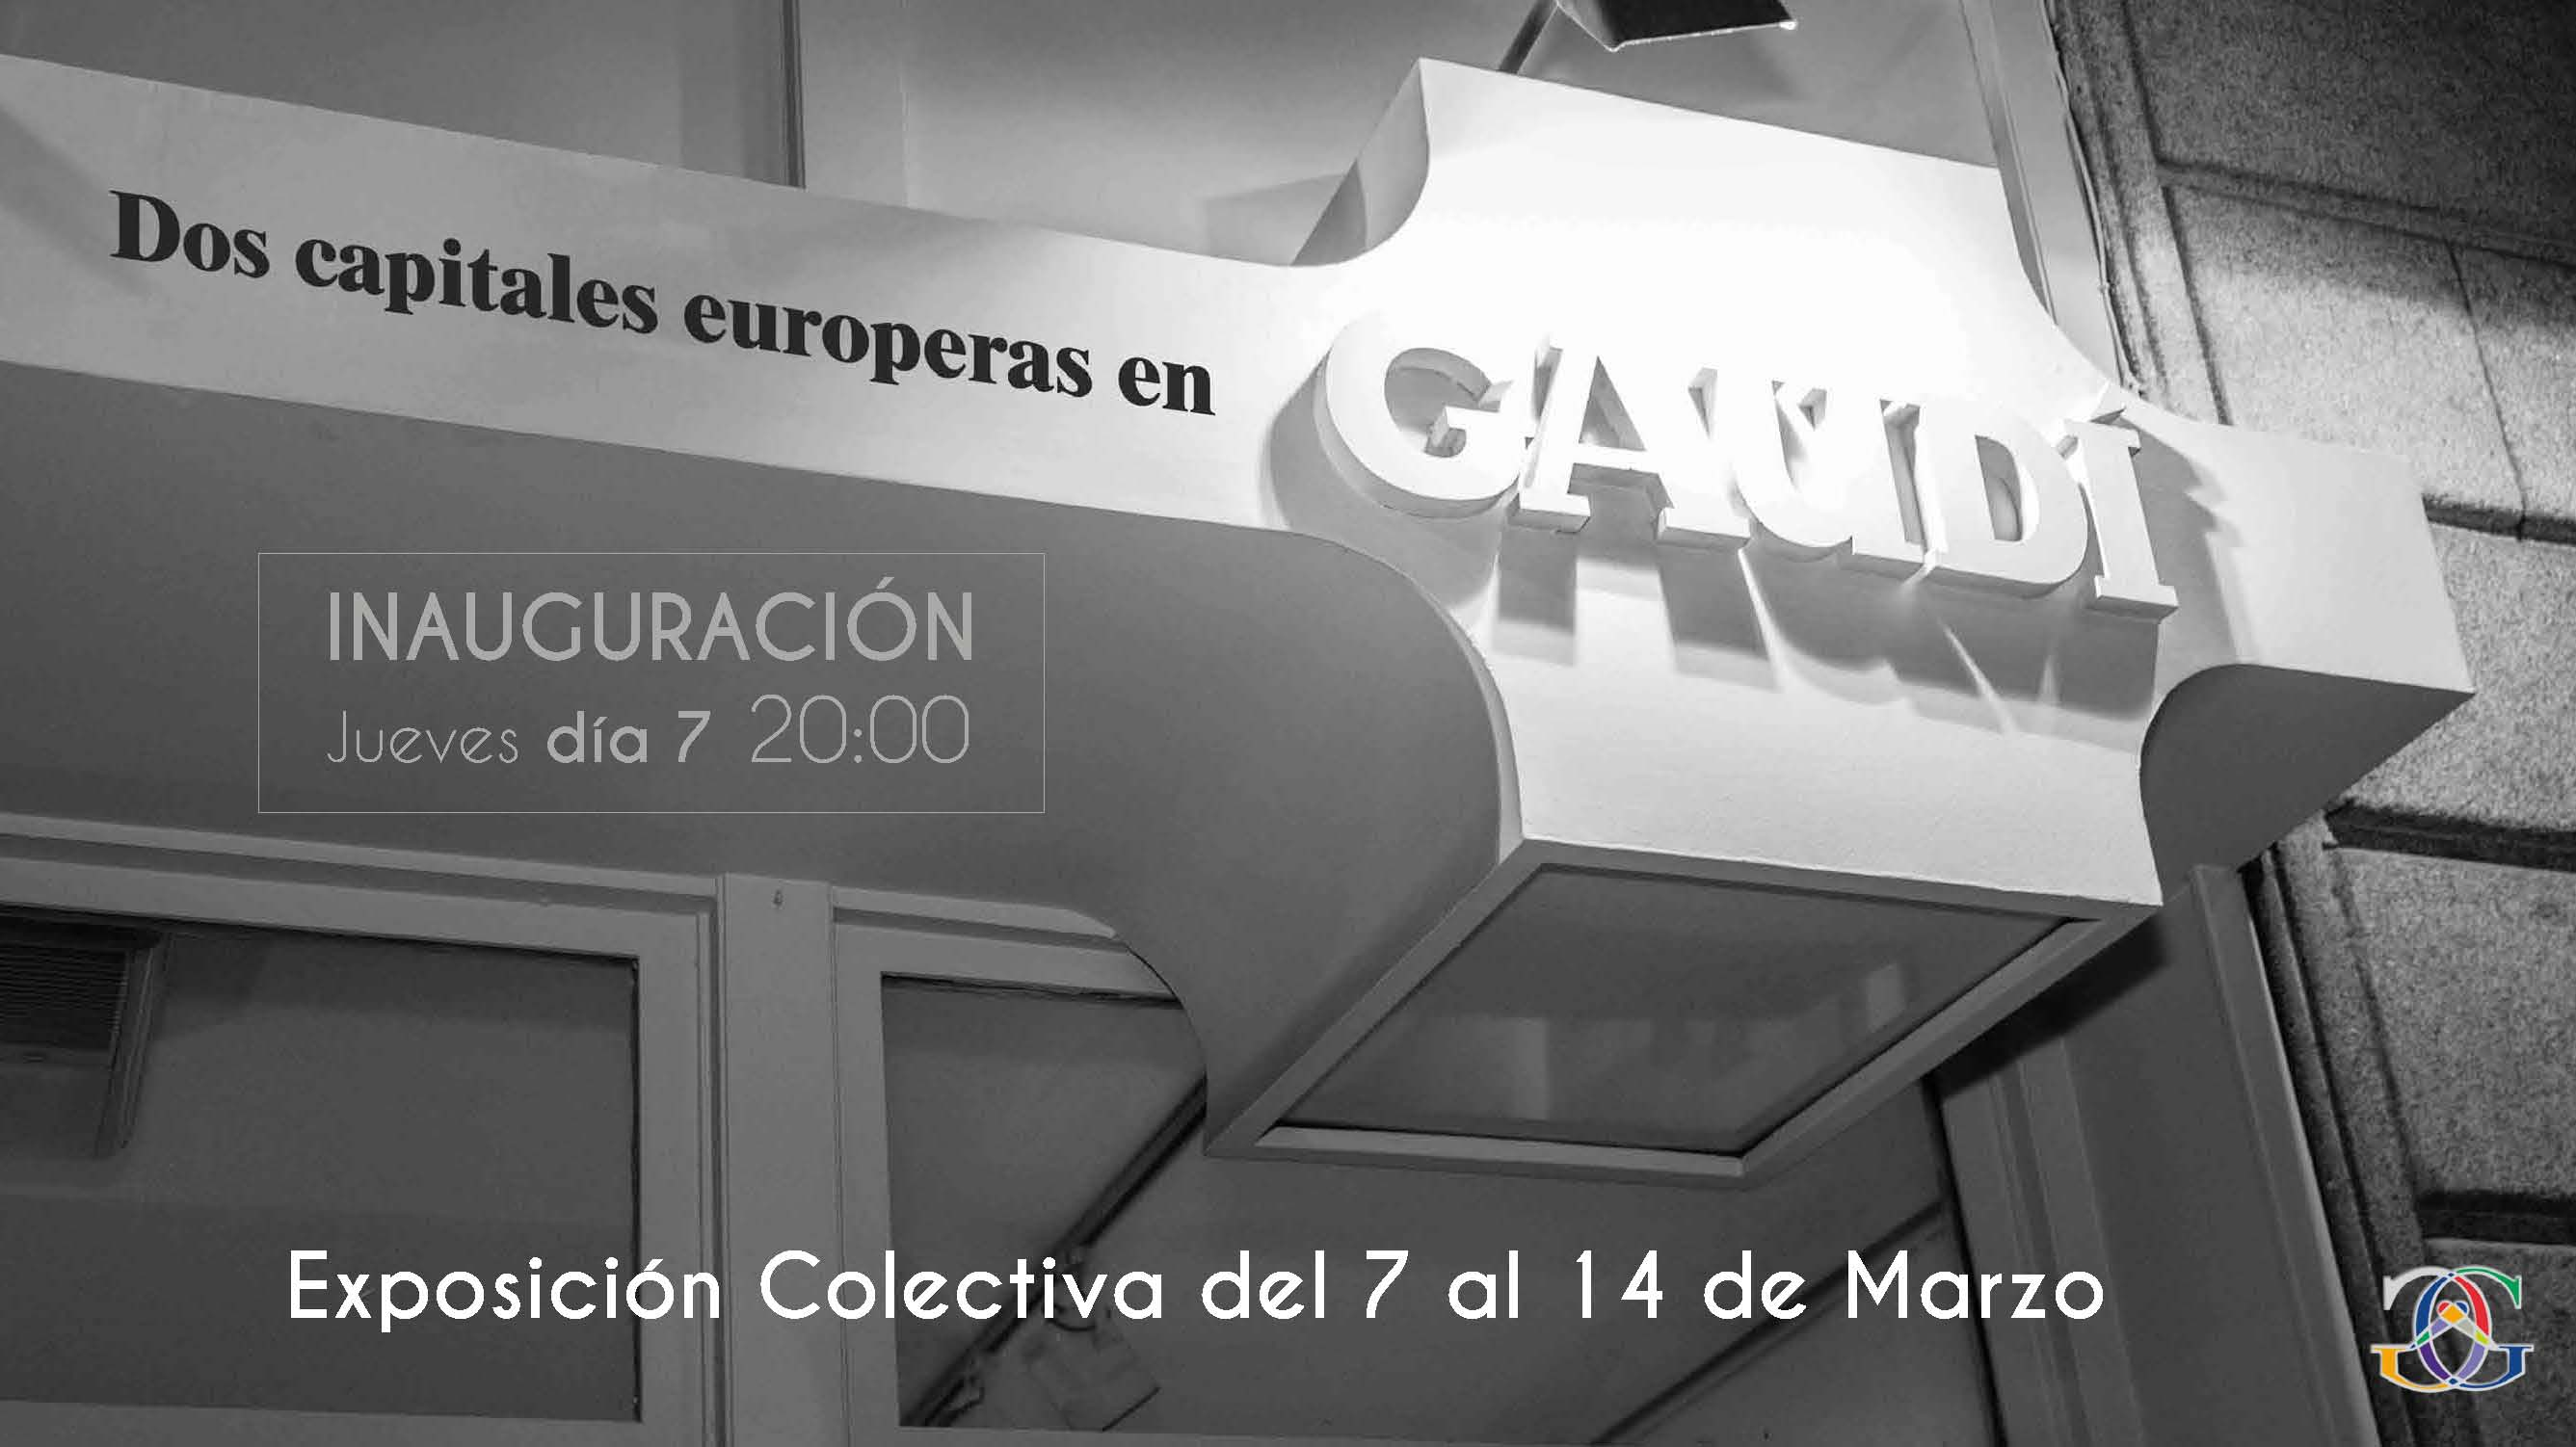 Dos capitales europeas en Gaudí